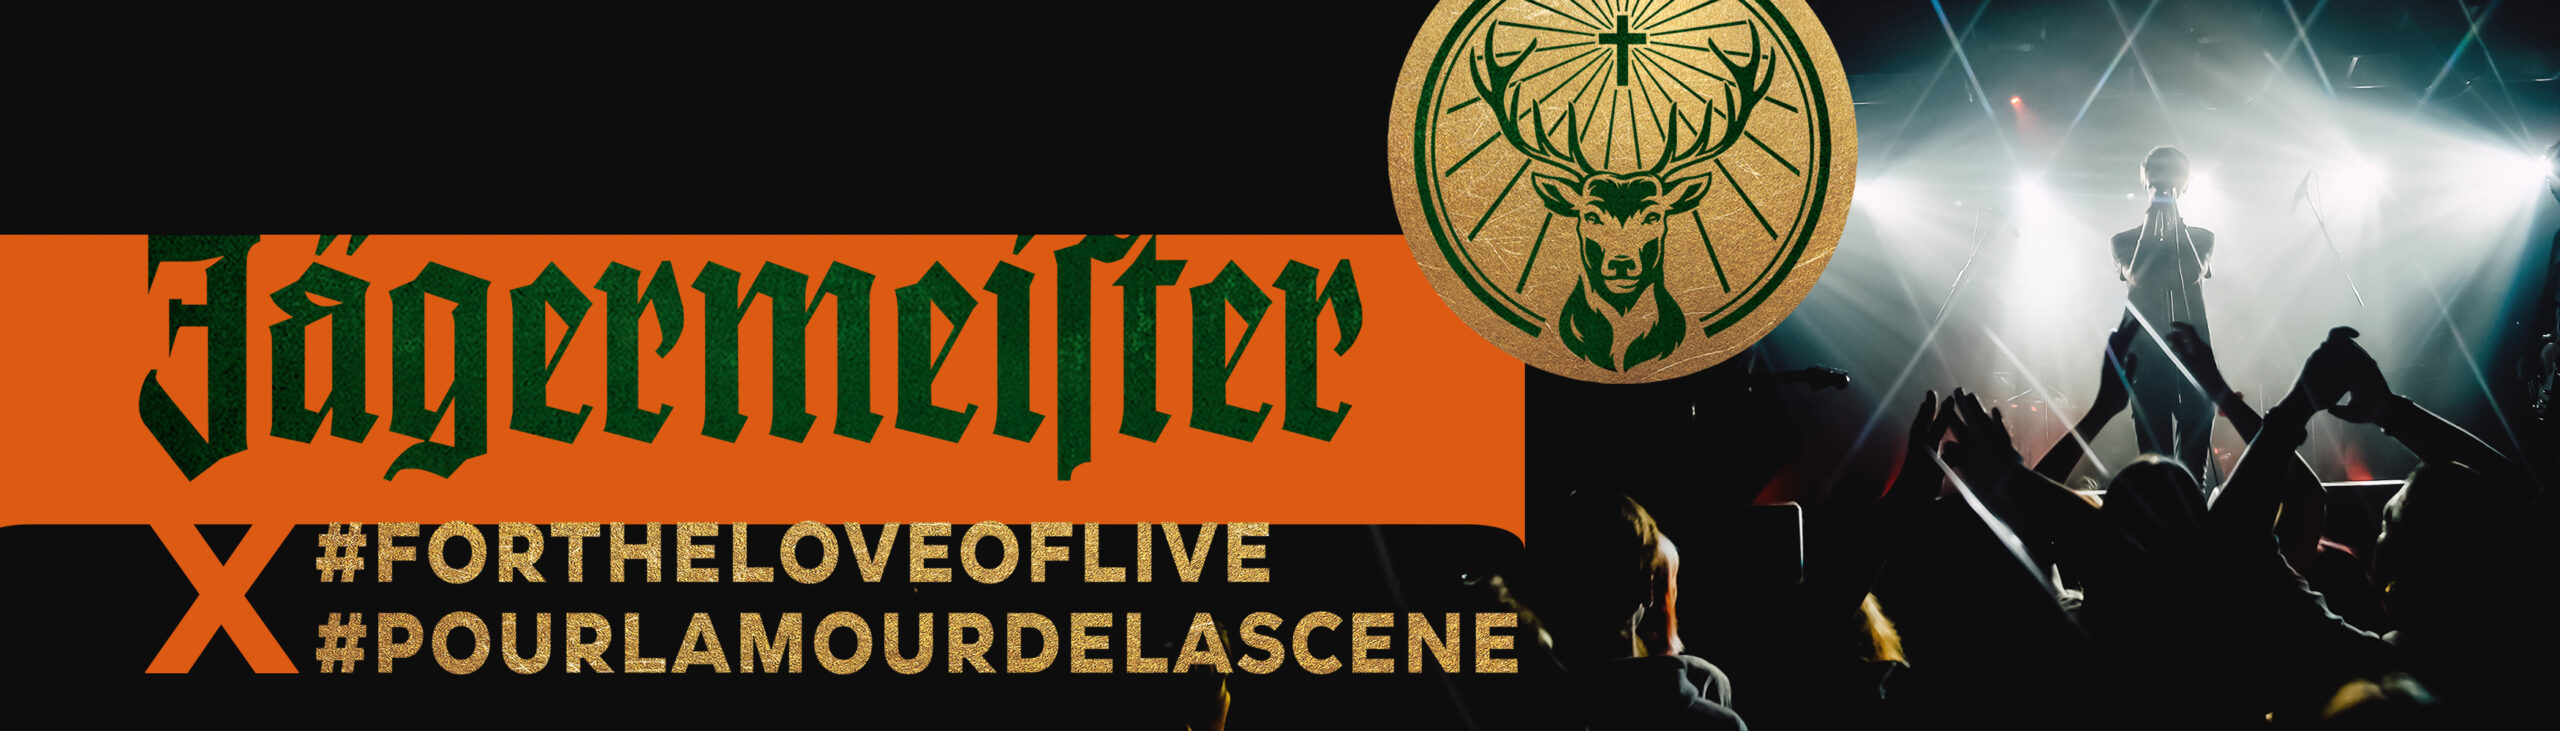 Jägermeister x #ForTheLoveOfLive campaign image